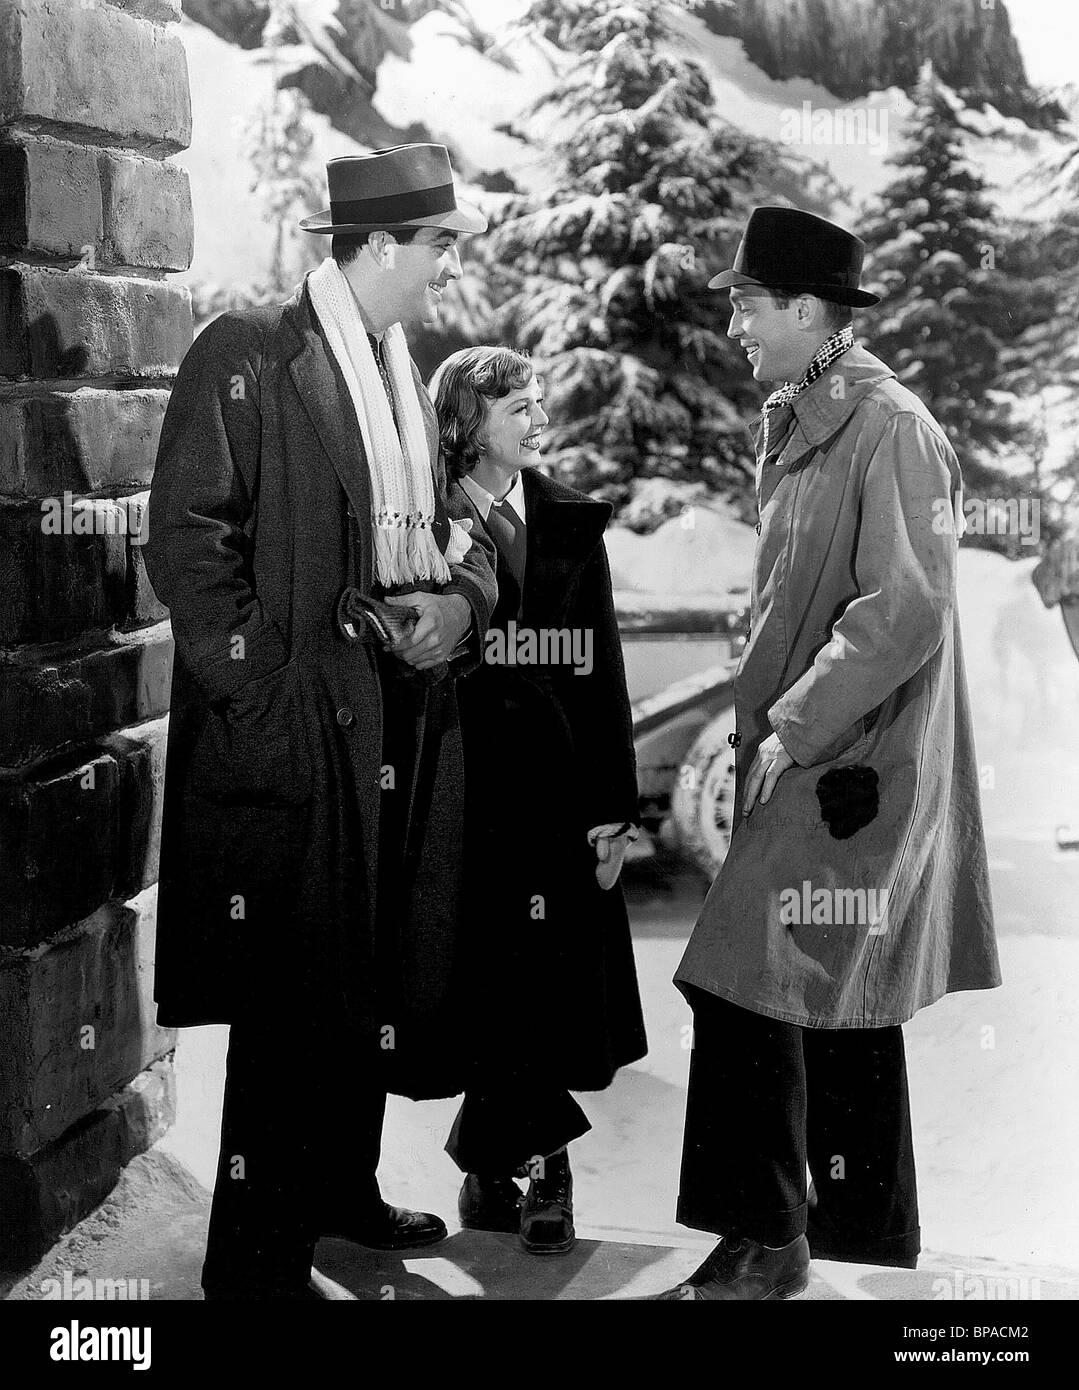 ROBERT TAYLOR, MARGARET SULLAVAN, Franchot Tone, tres camaradas, 1938 Imagen De Stock